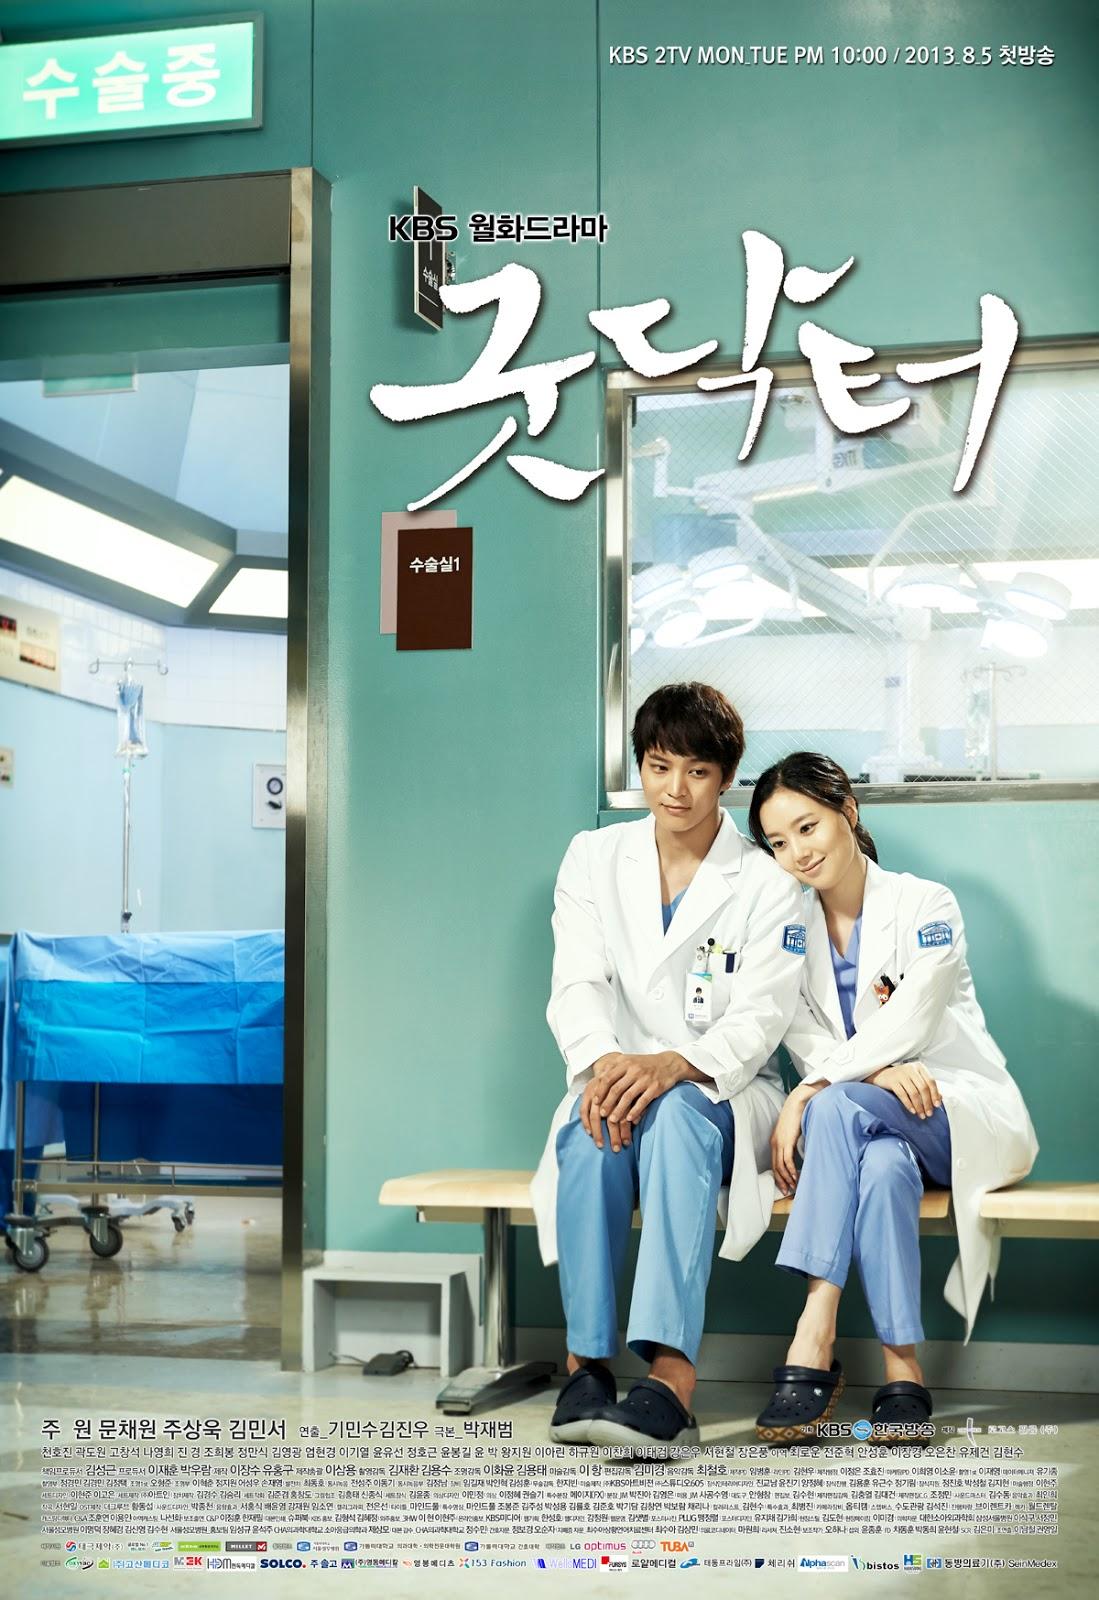 36482-muon-sac-cuoc-doi-good-doctor-poster